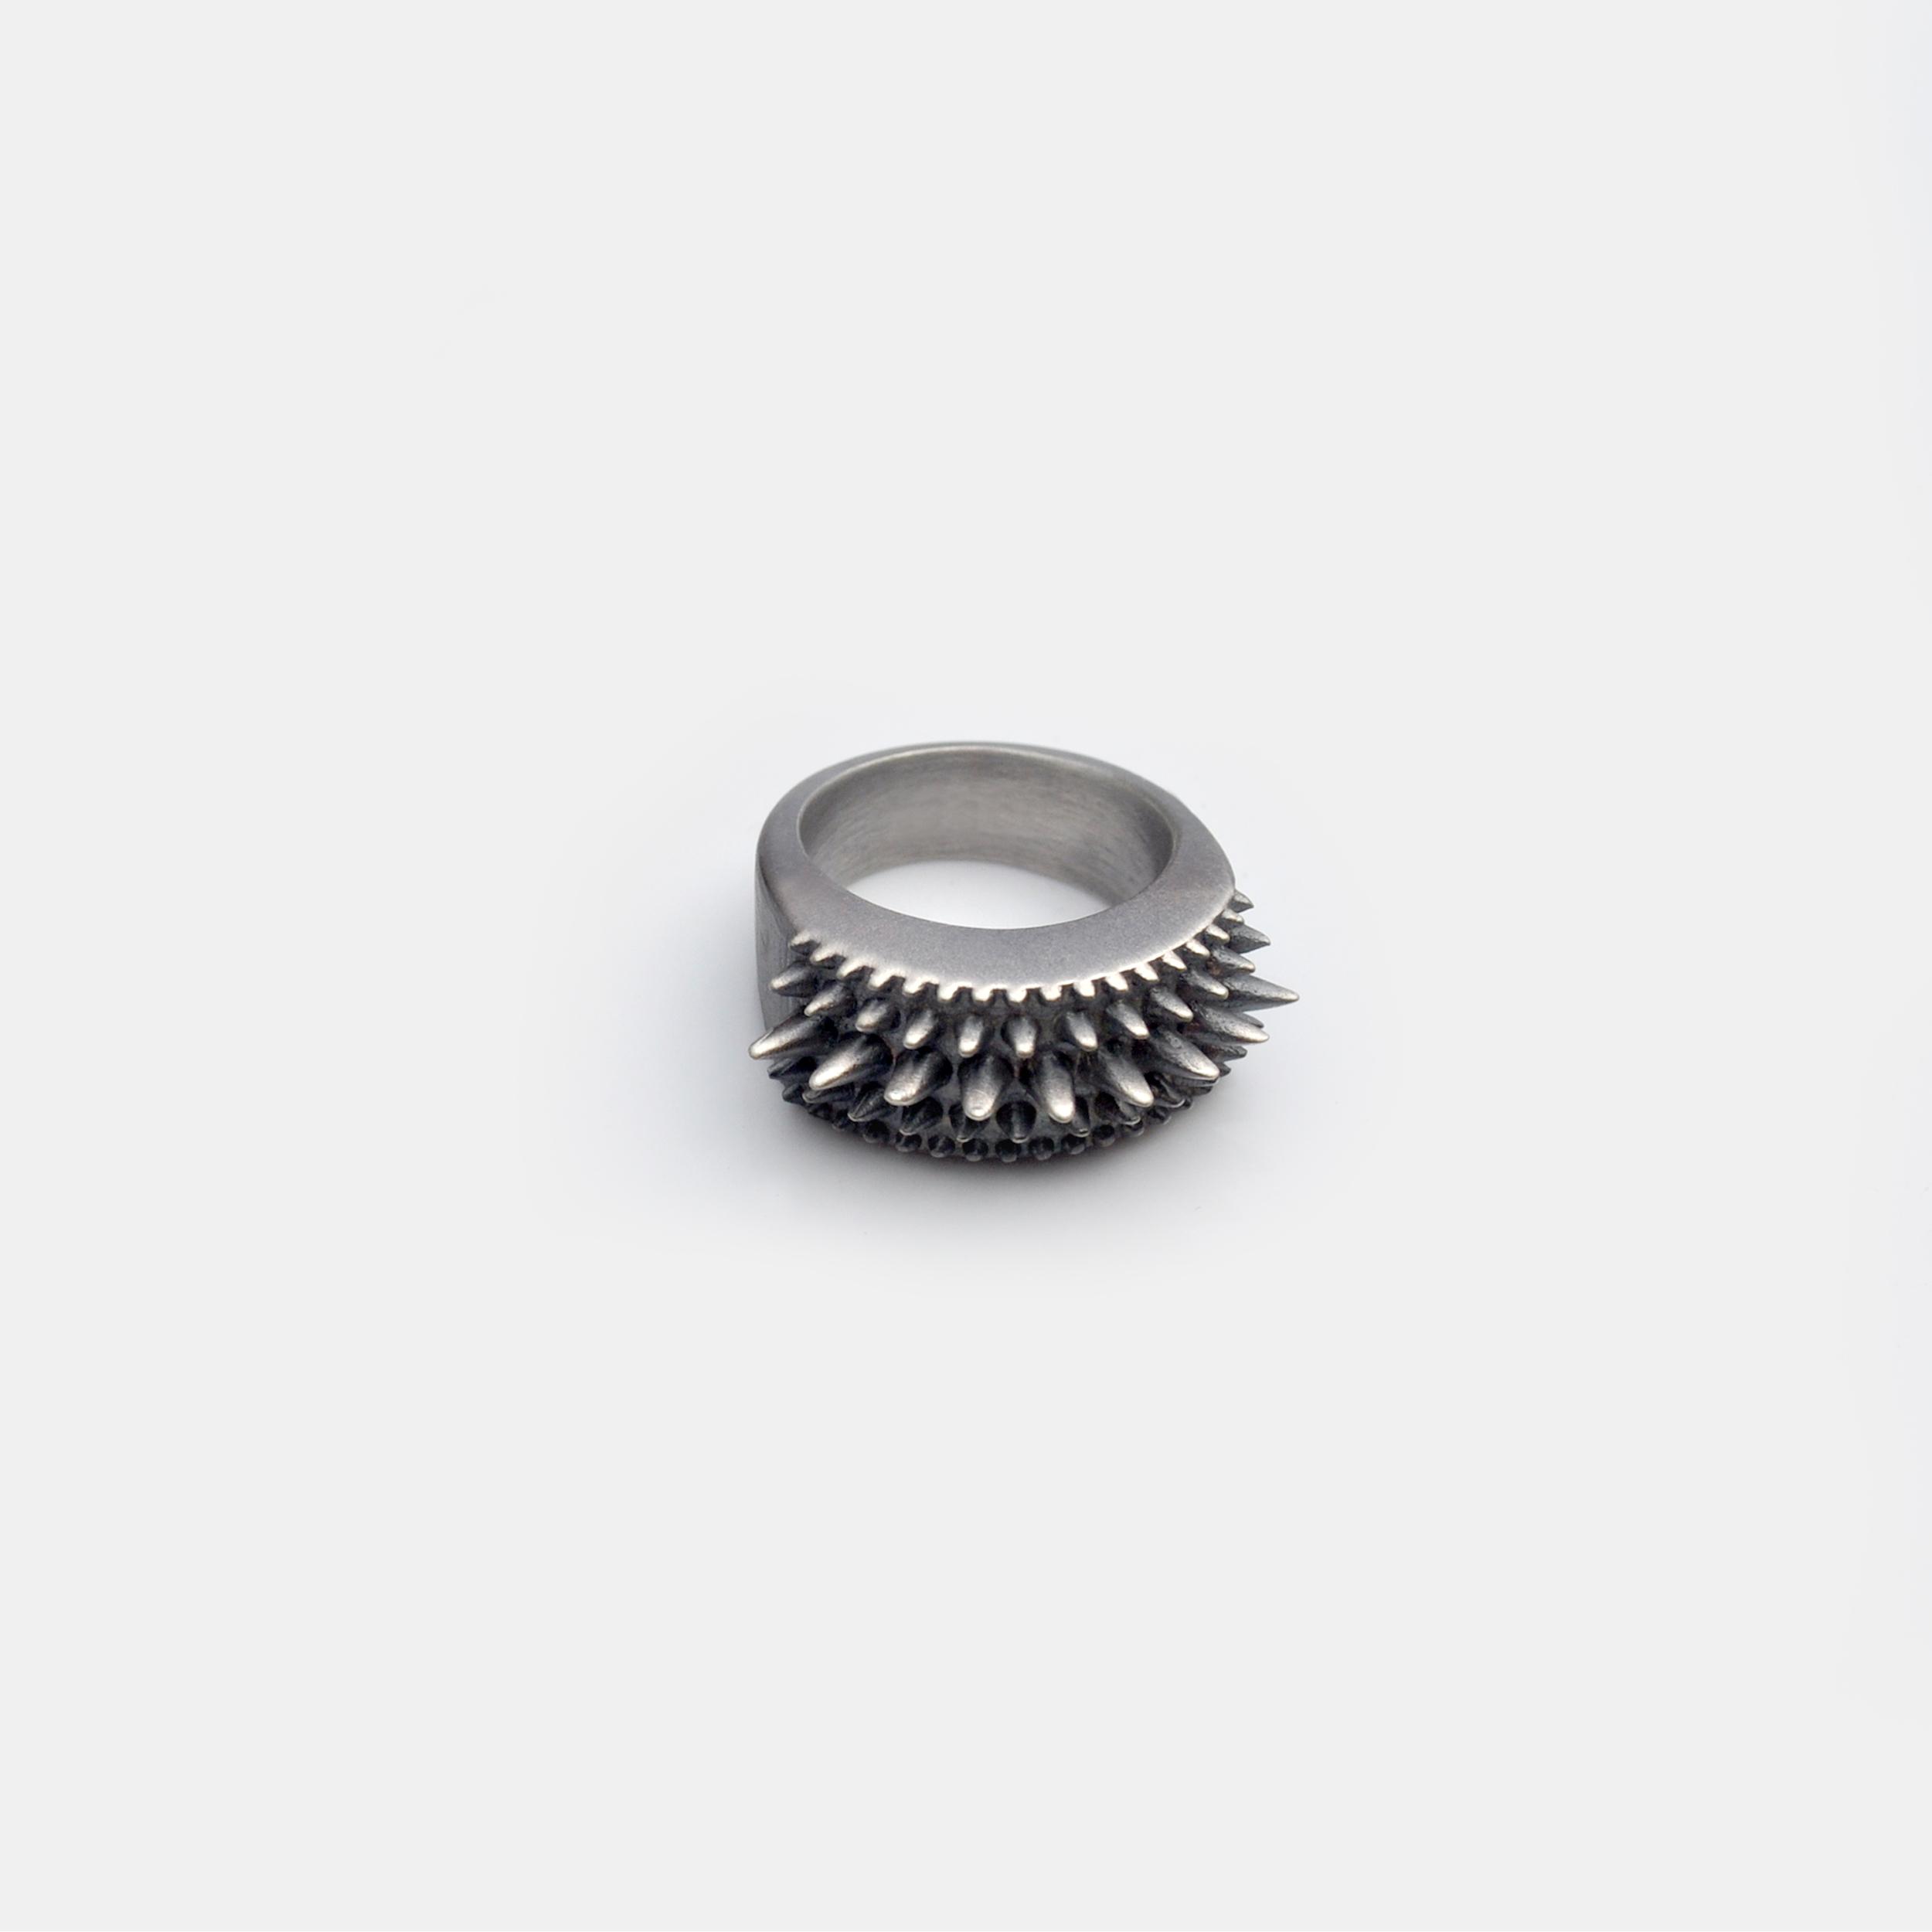 Marisa_Lomonaco_Hudson_Valley_custom_Jewelry_0004_Sterling_Silver_Black_Points_Ring.jpg